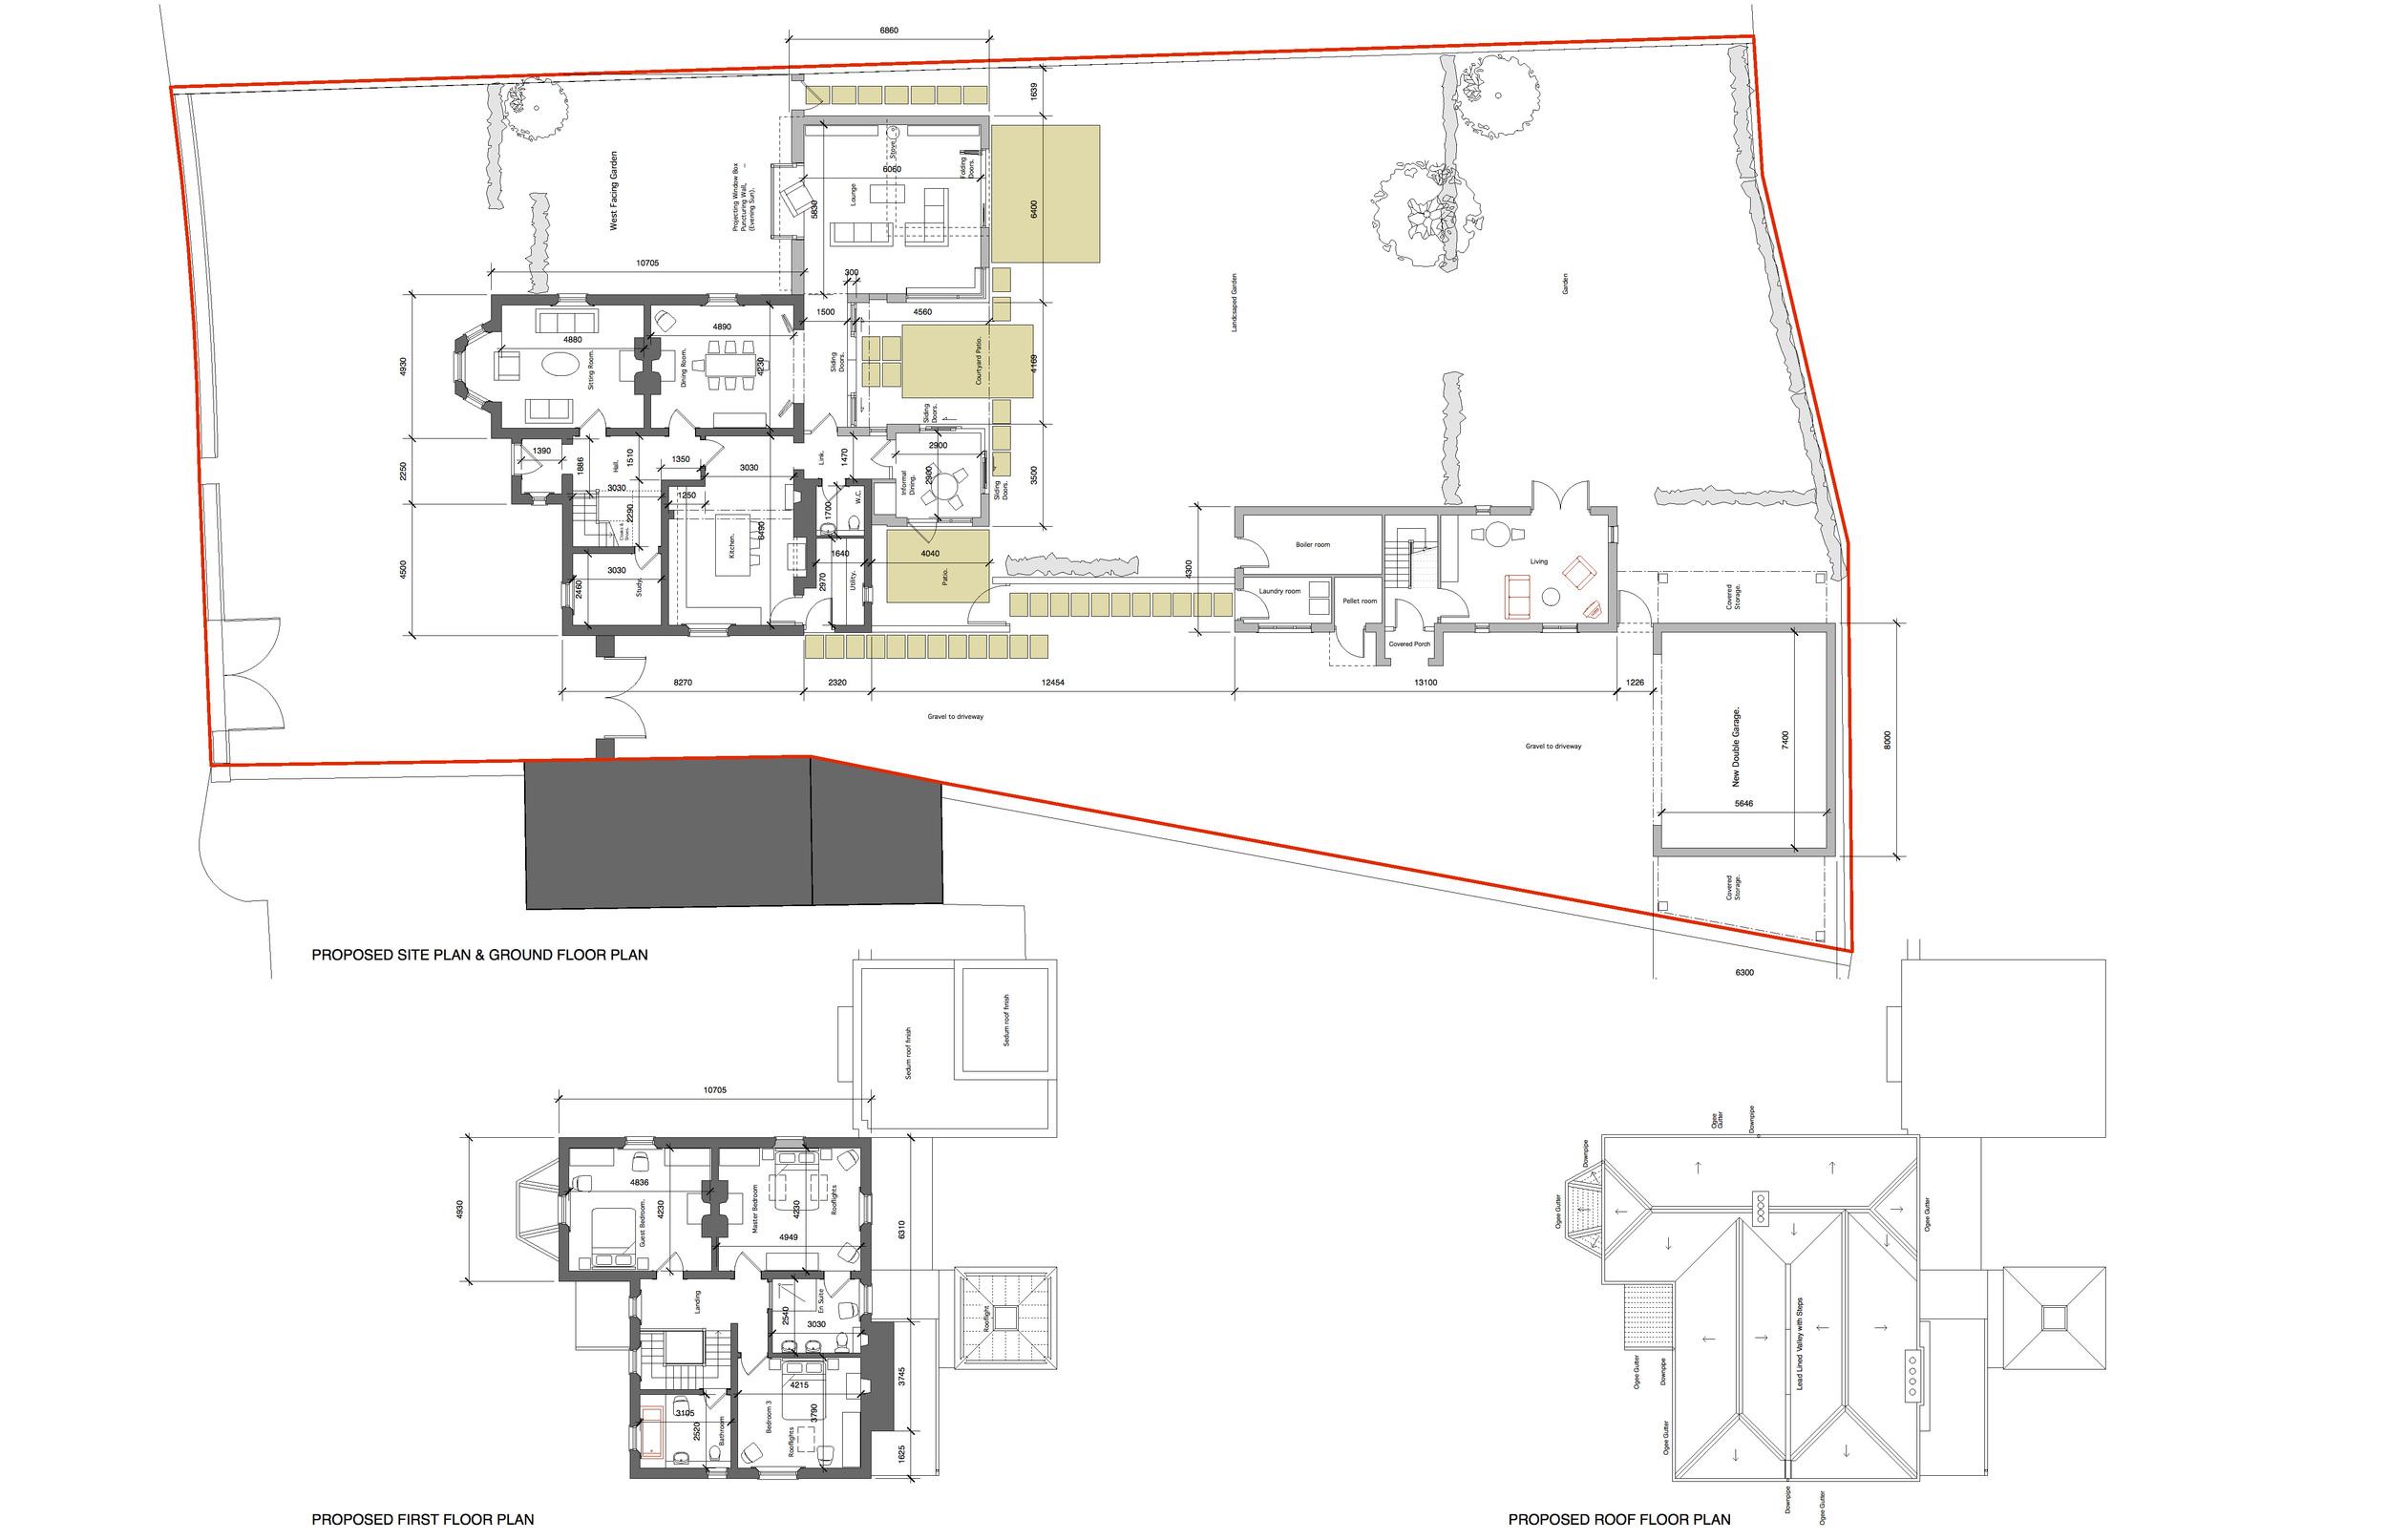 Plans_Extension_Renovation_Naas_Kildare.jpg